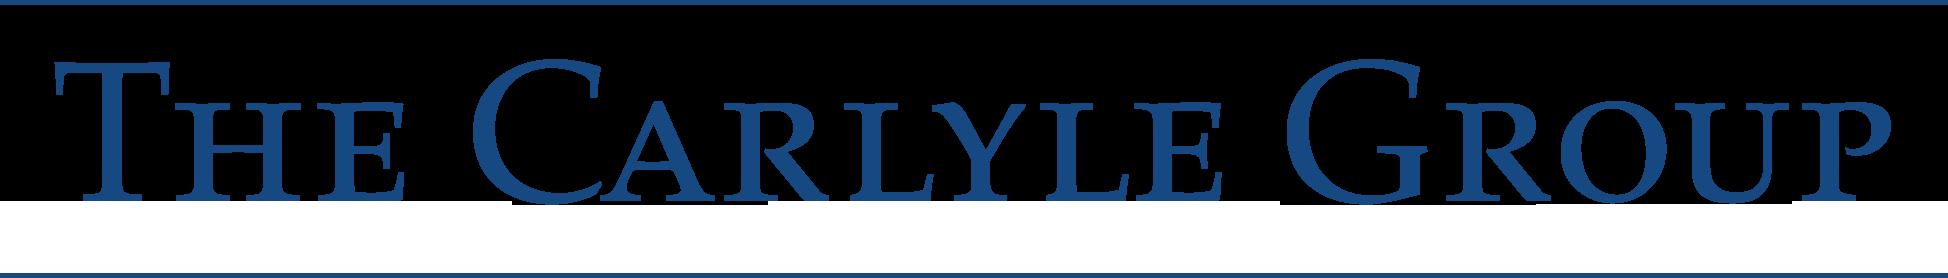 carlyle_group_logo.jpg